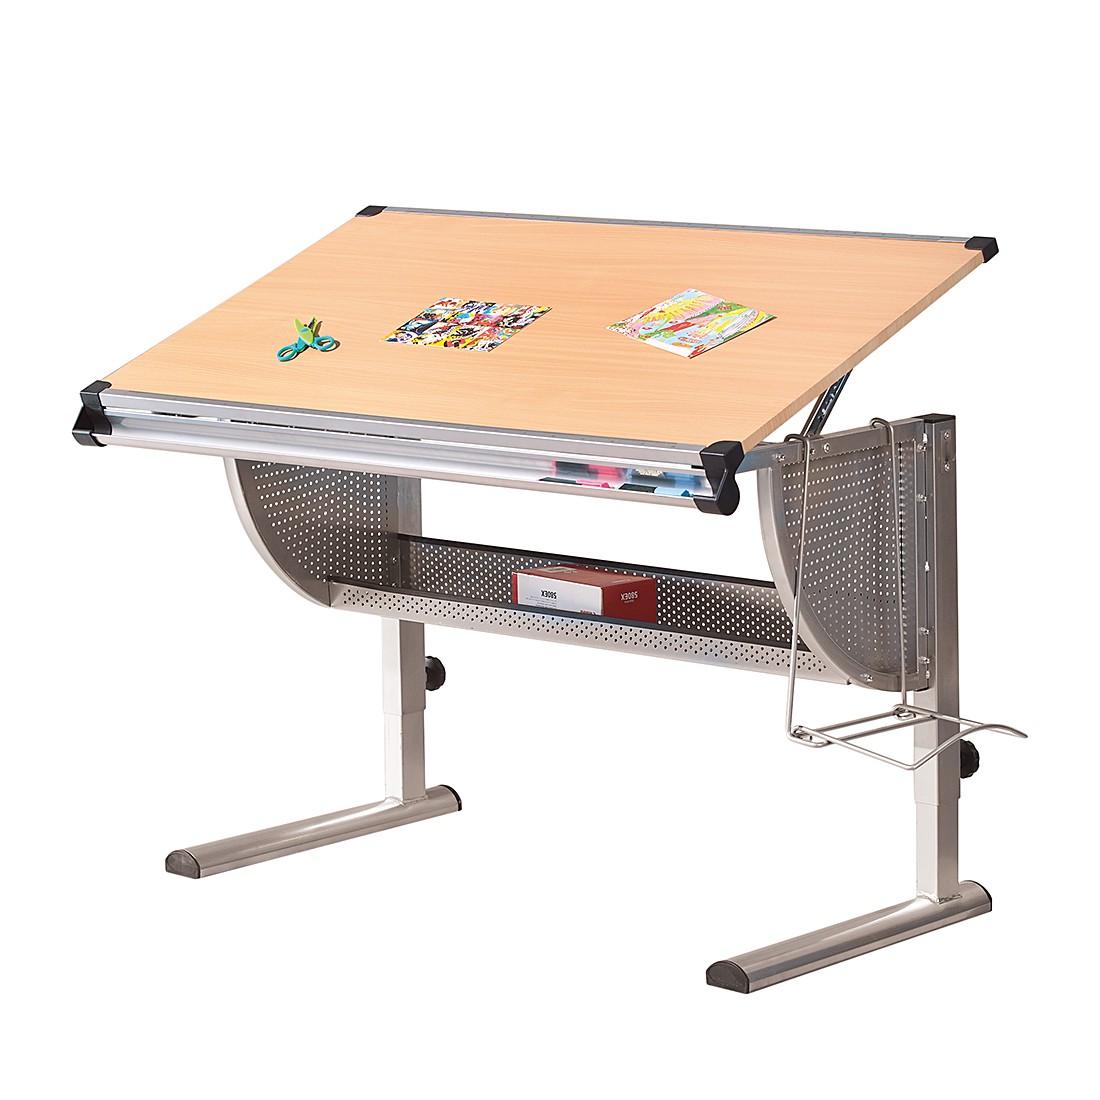 Sedia mercatone uno ecopelle - Mobili cucina profondita 50 cm ikea ...